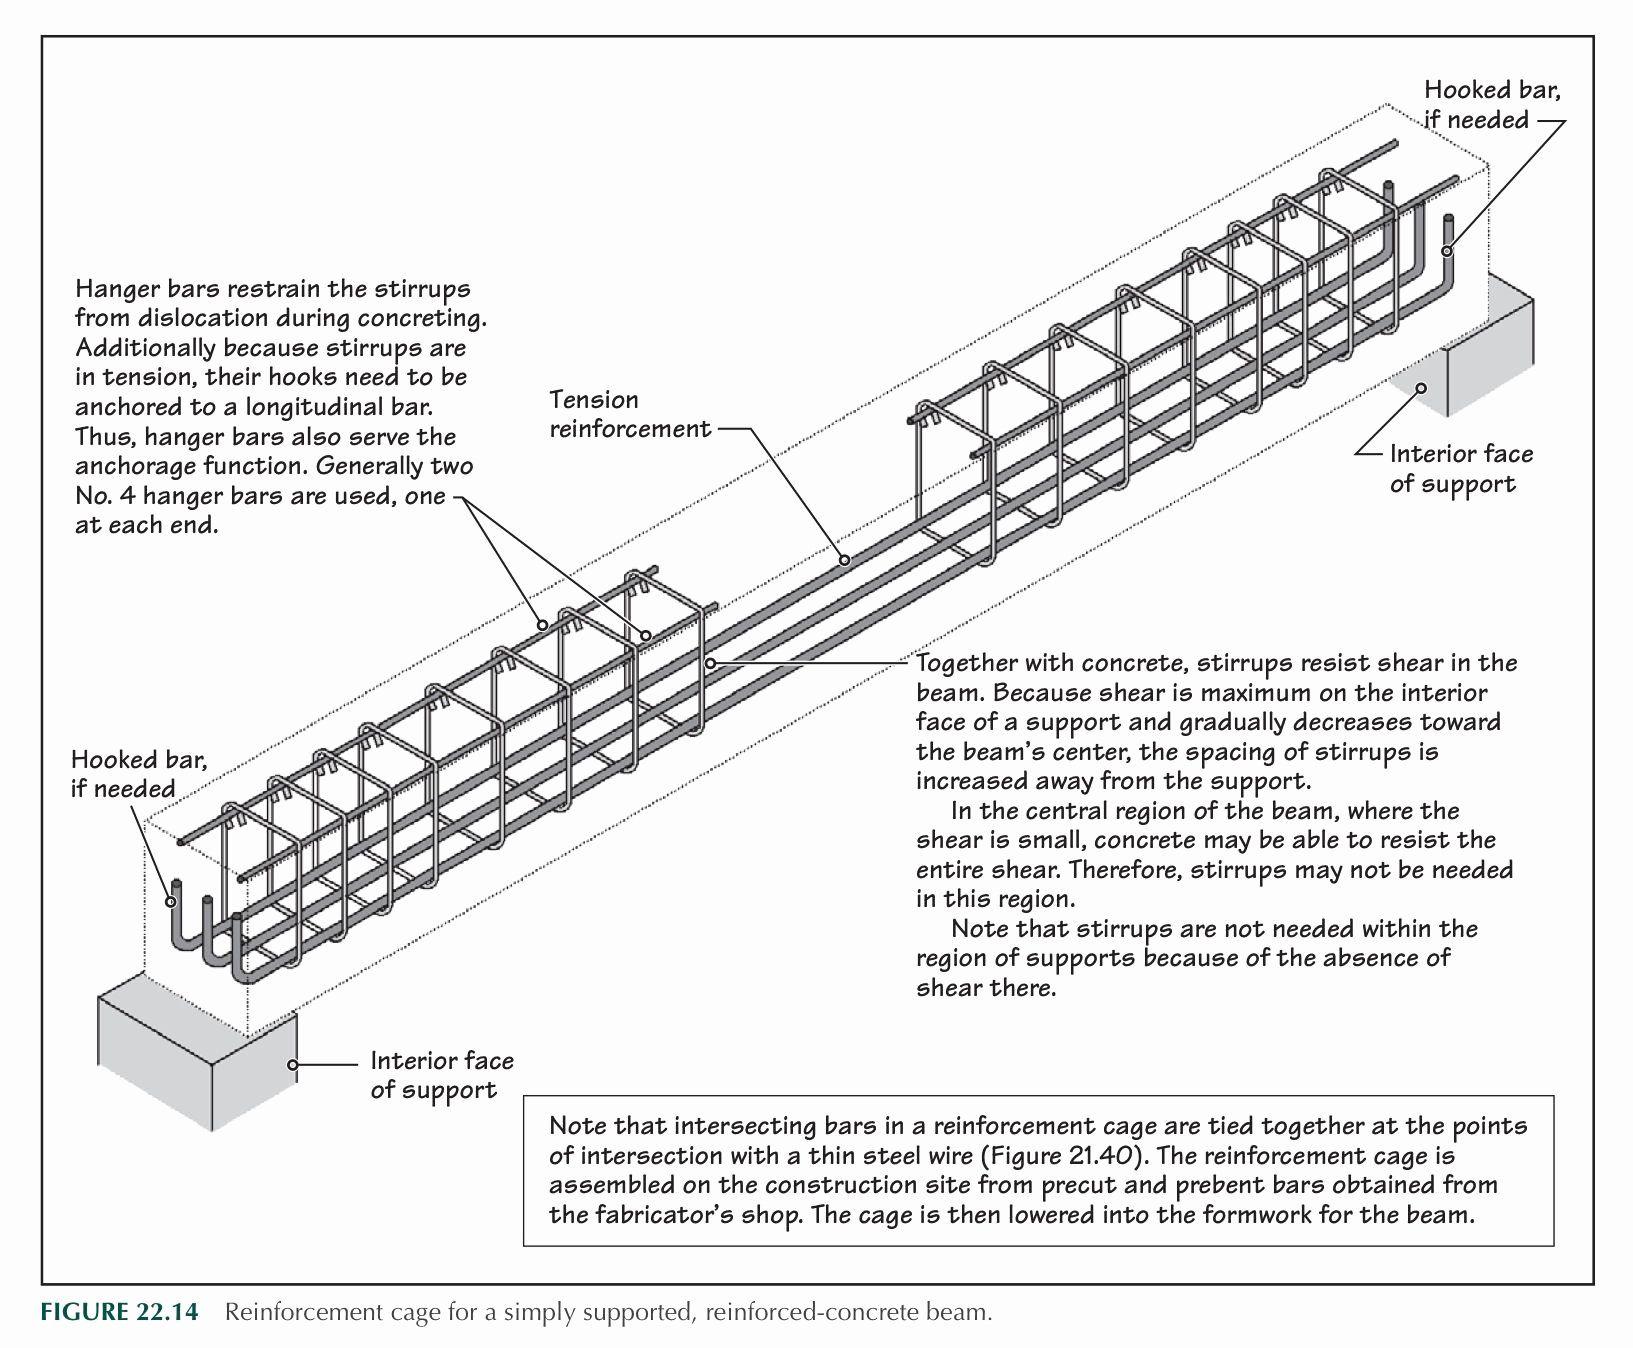 Structural Design And Drawing Book Unique Beam Reinforced Details A A ˆa A ªa A A A In 2019 In 2020 Precast Concrete Roof Truss Design Concrete Porch